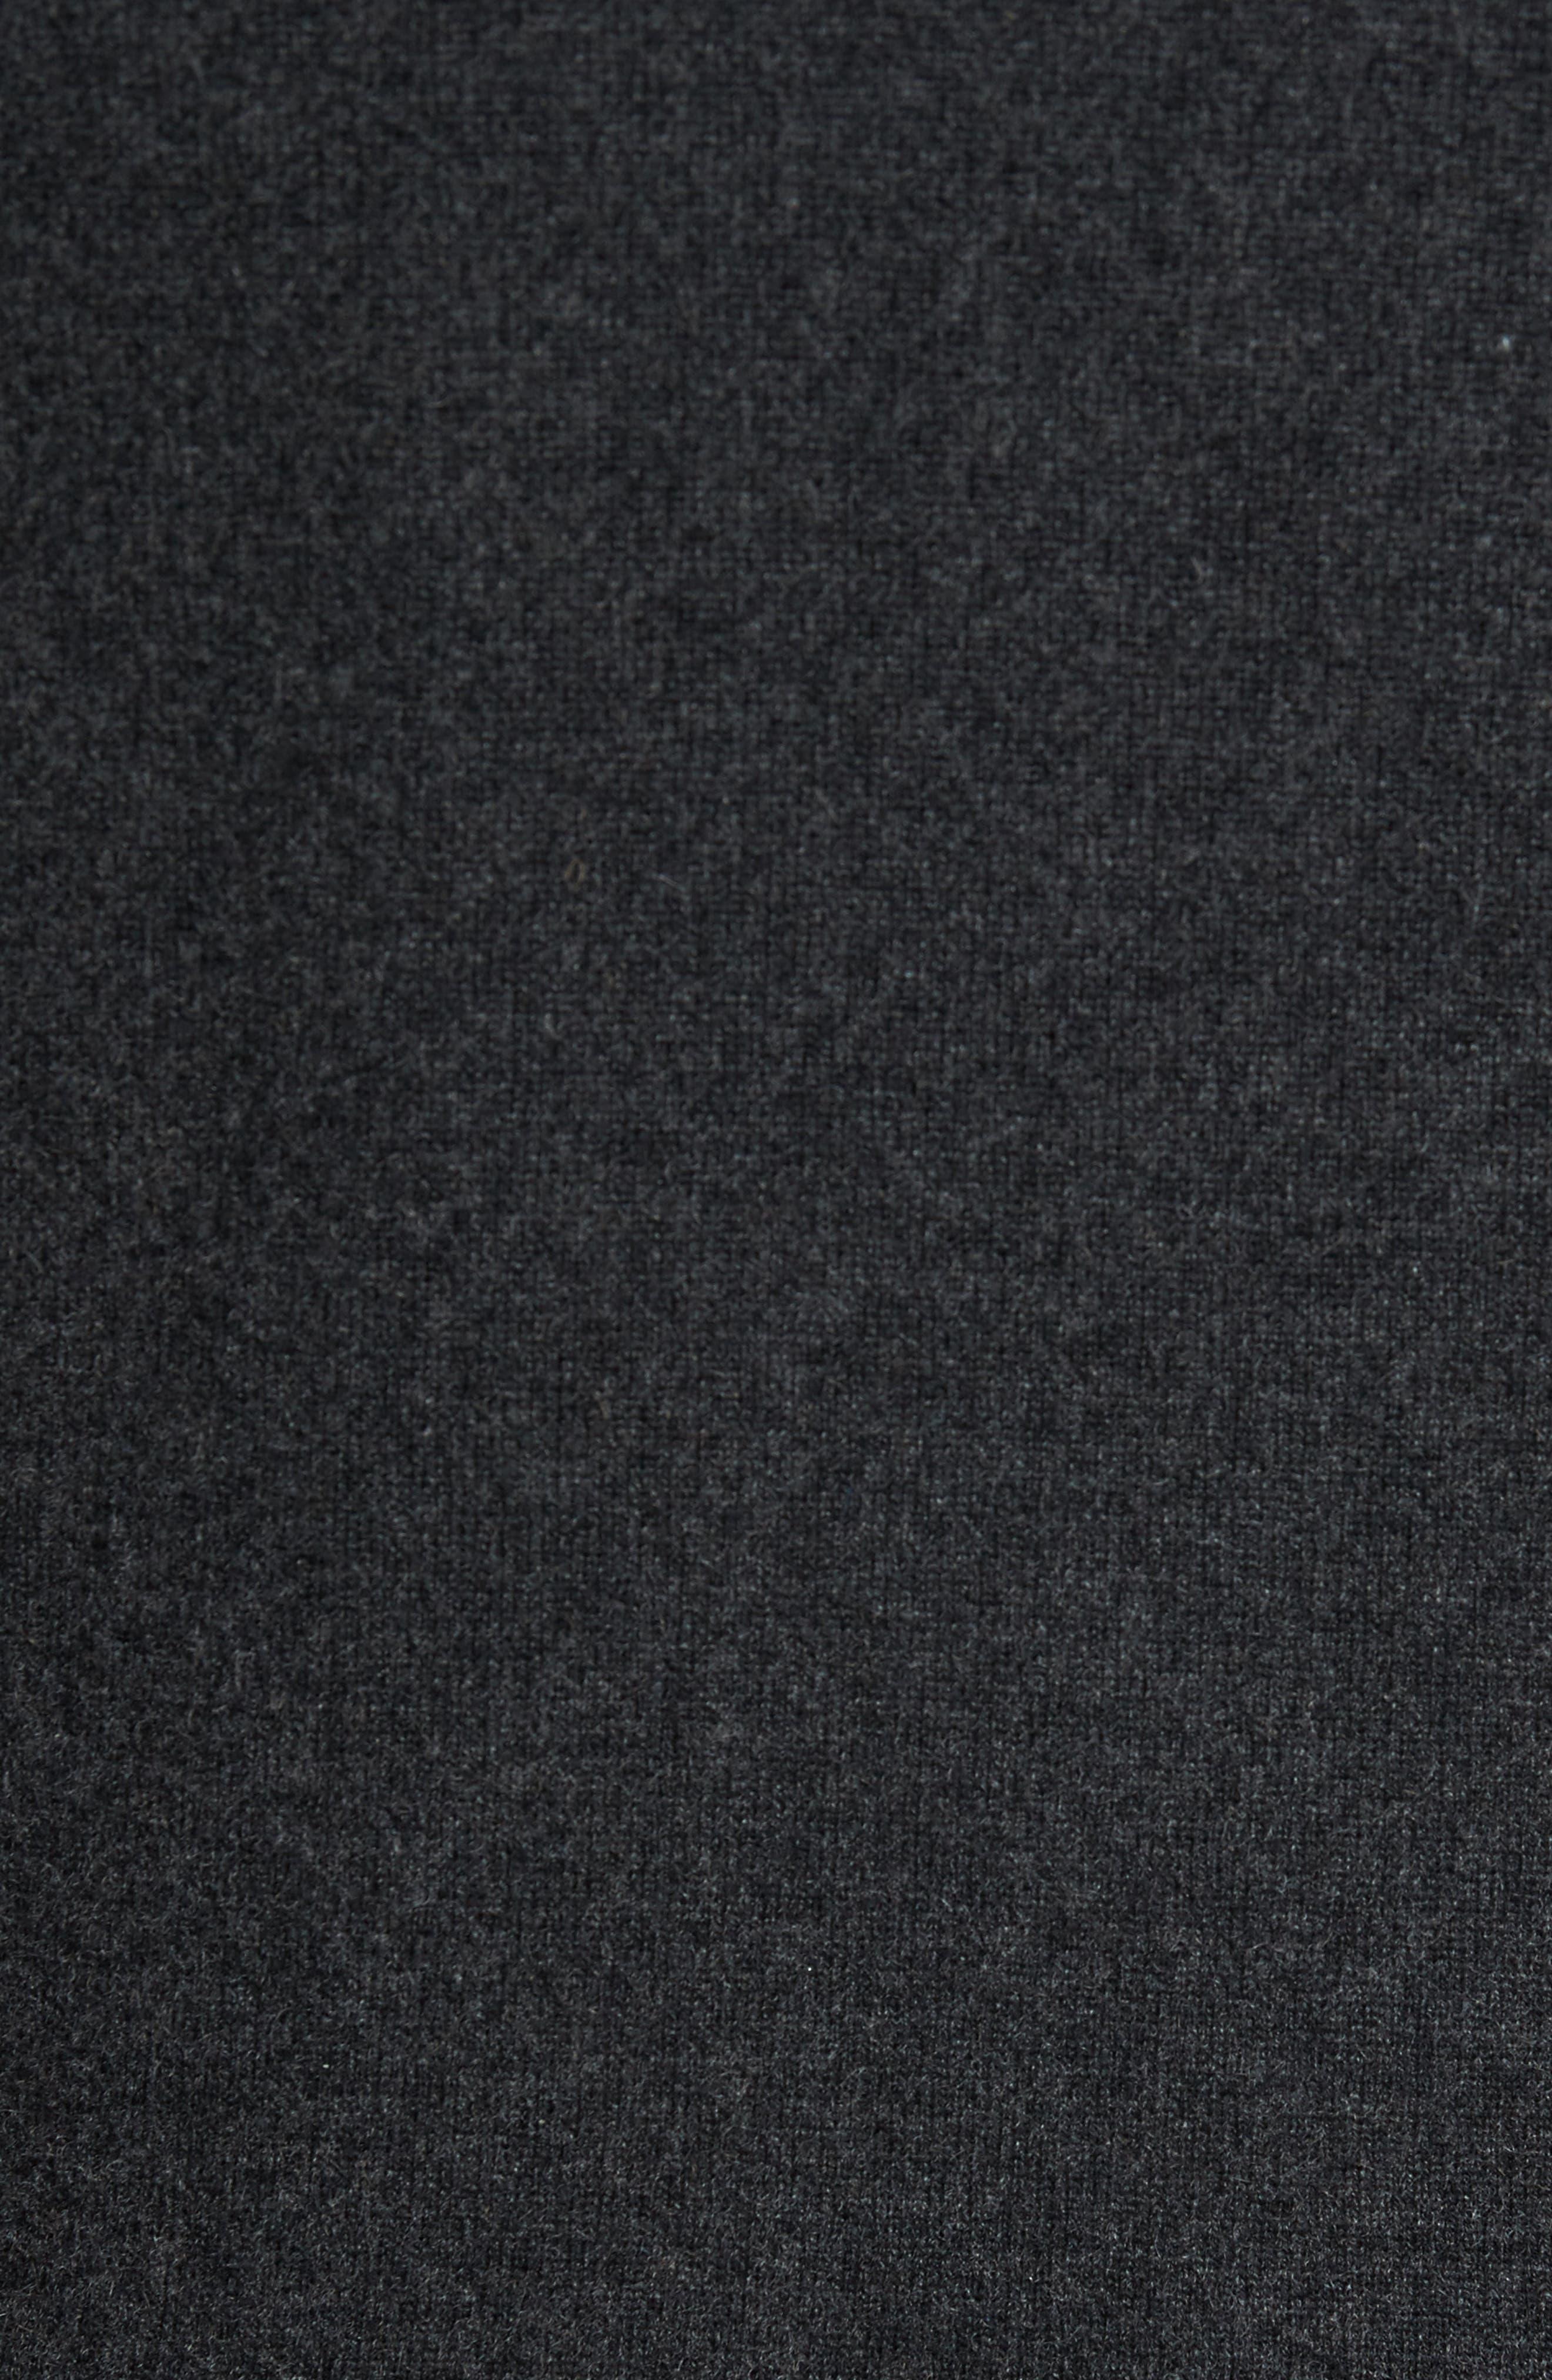 Cashmere V-Neck Sweater,                             Alternate thumbnail 25, color,